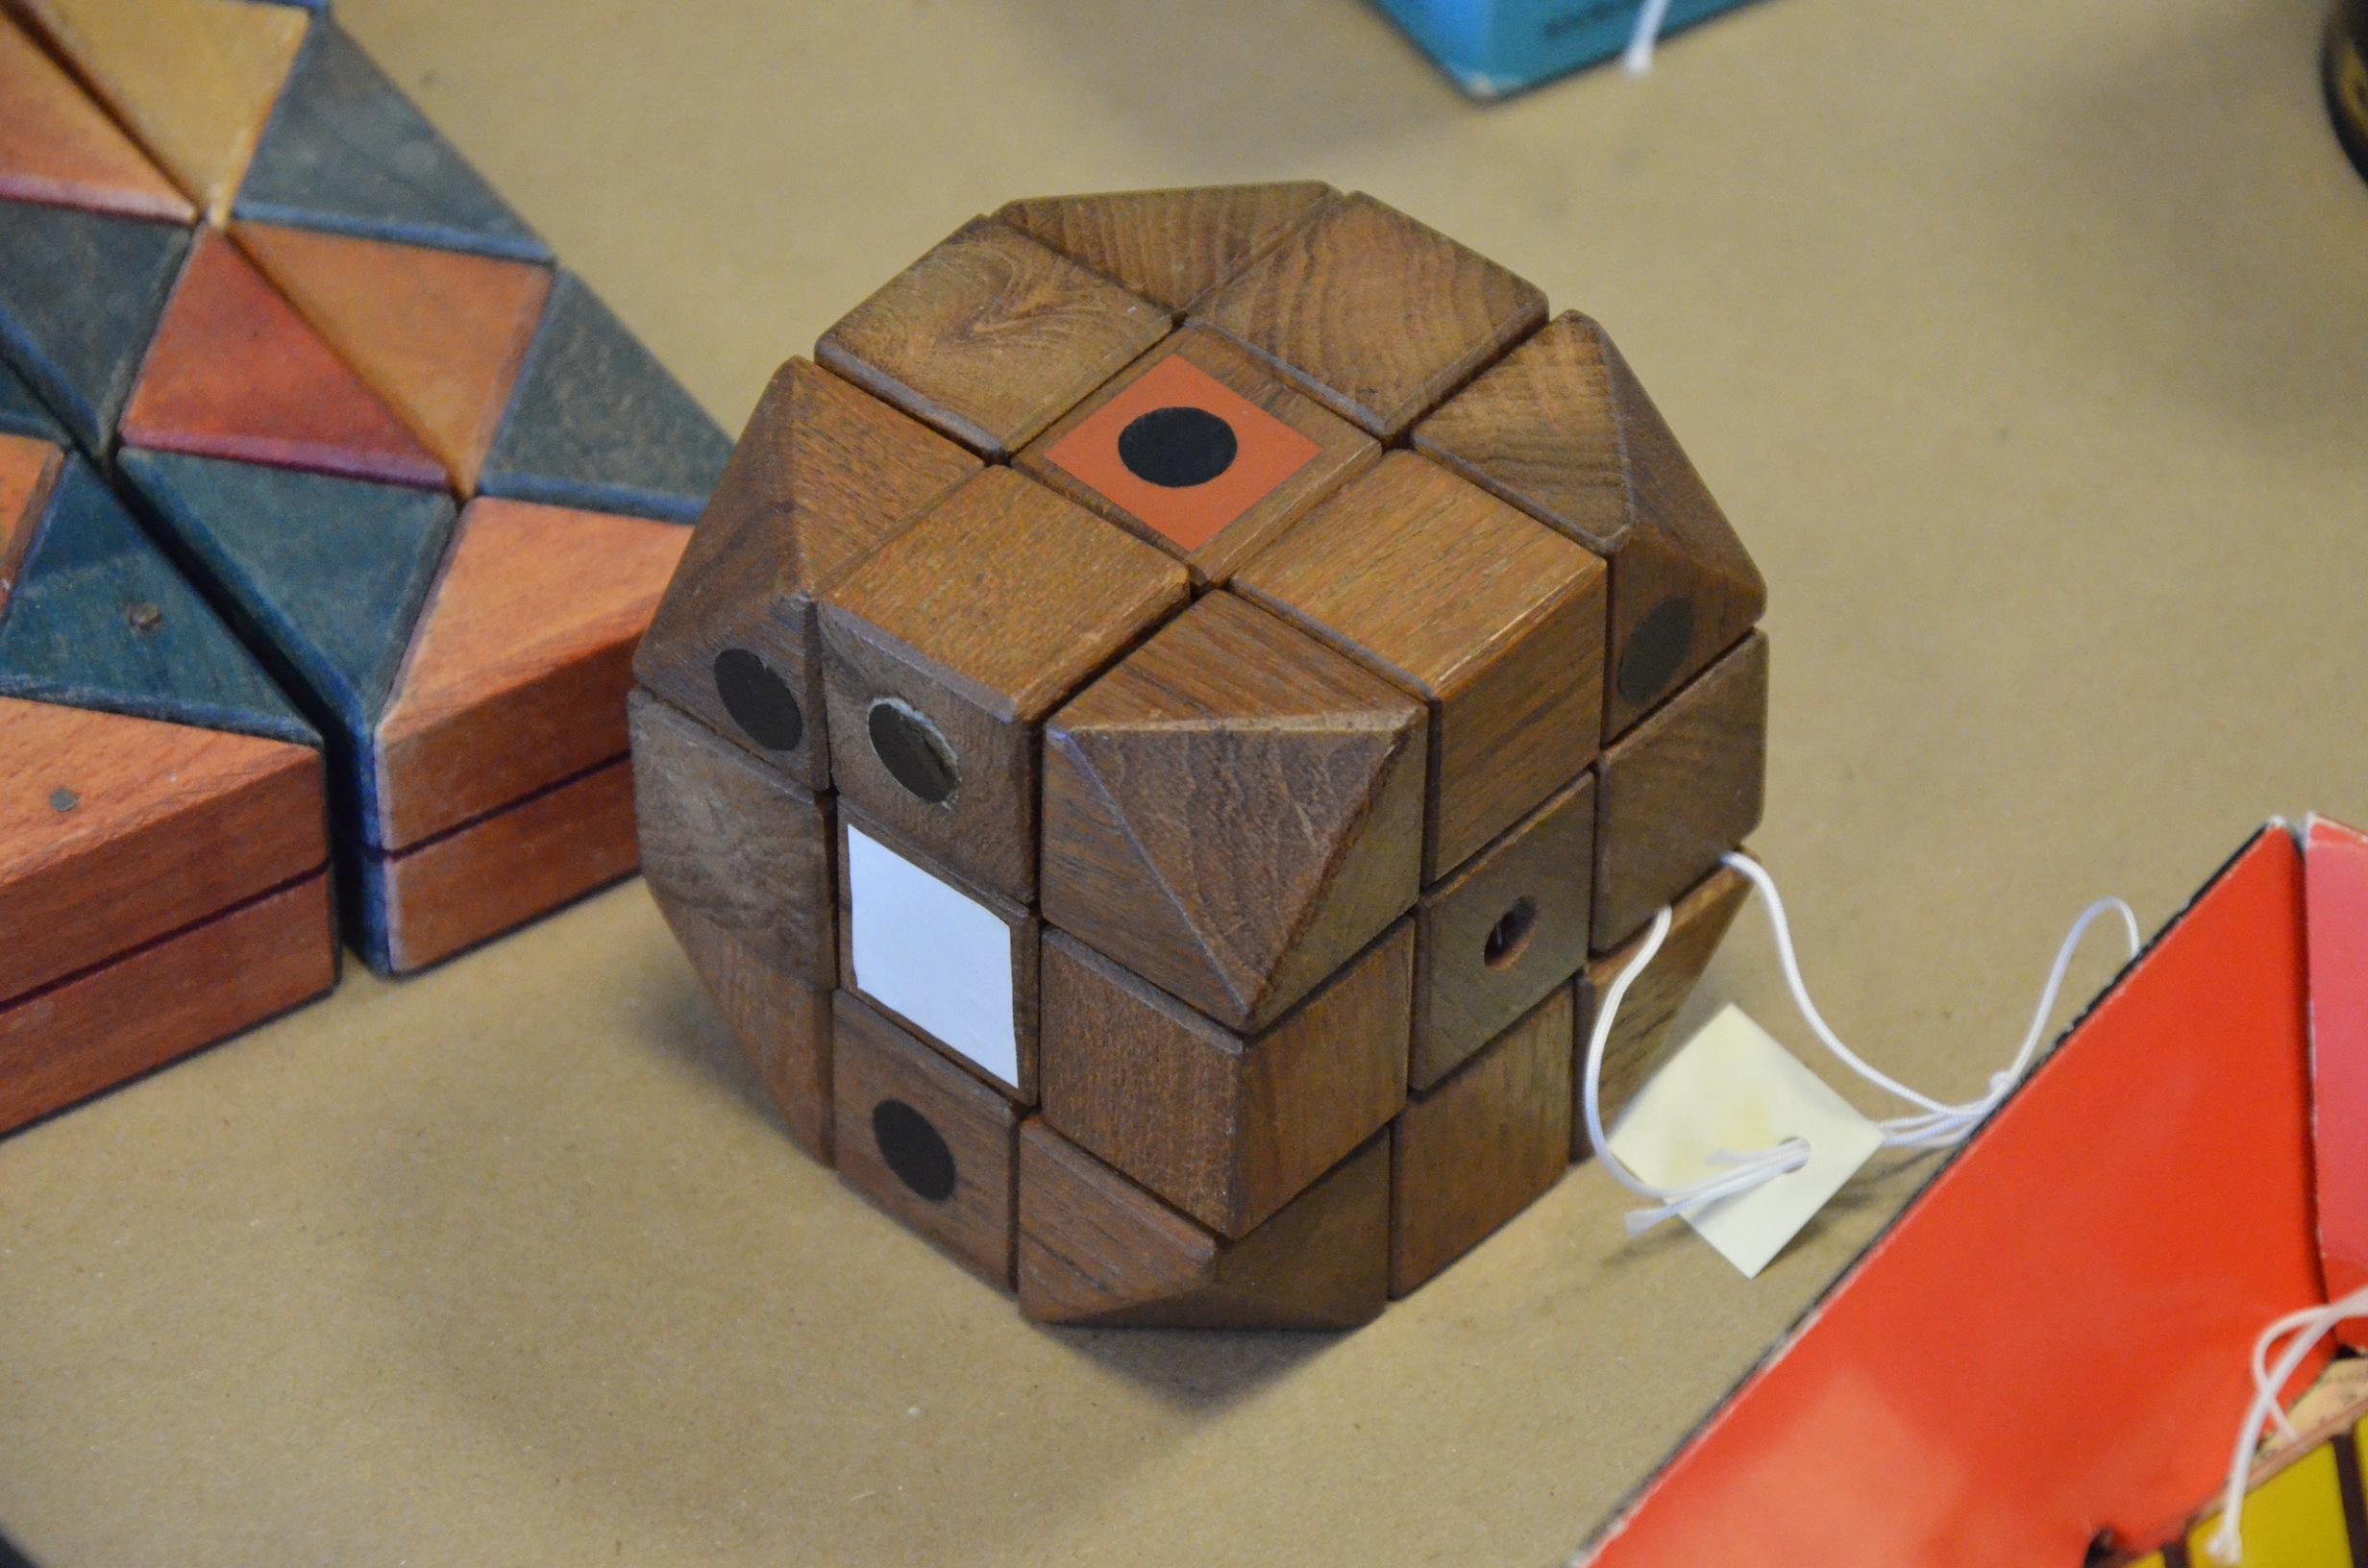 Original Rubik's cube prototype, dark and colored wood. Via Google Images.